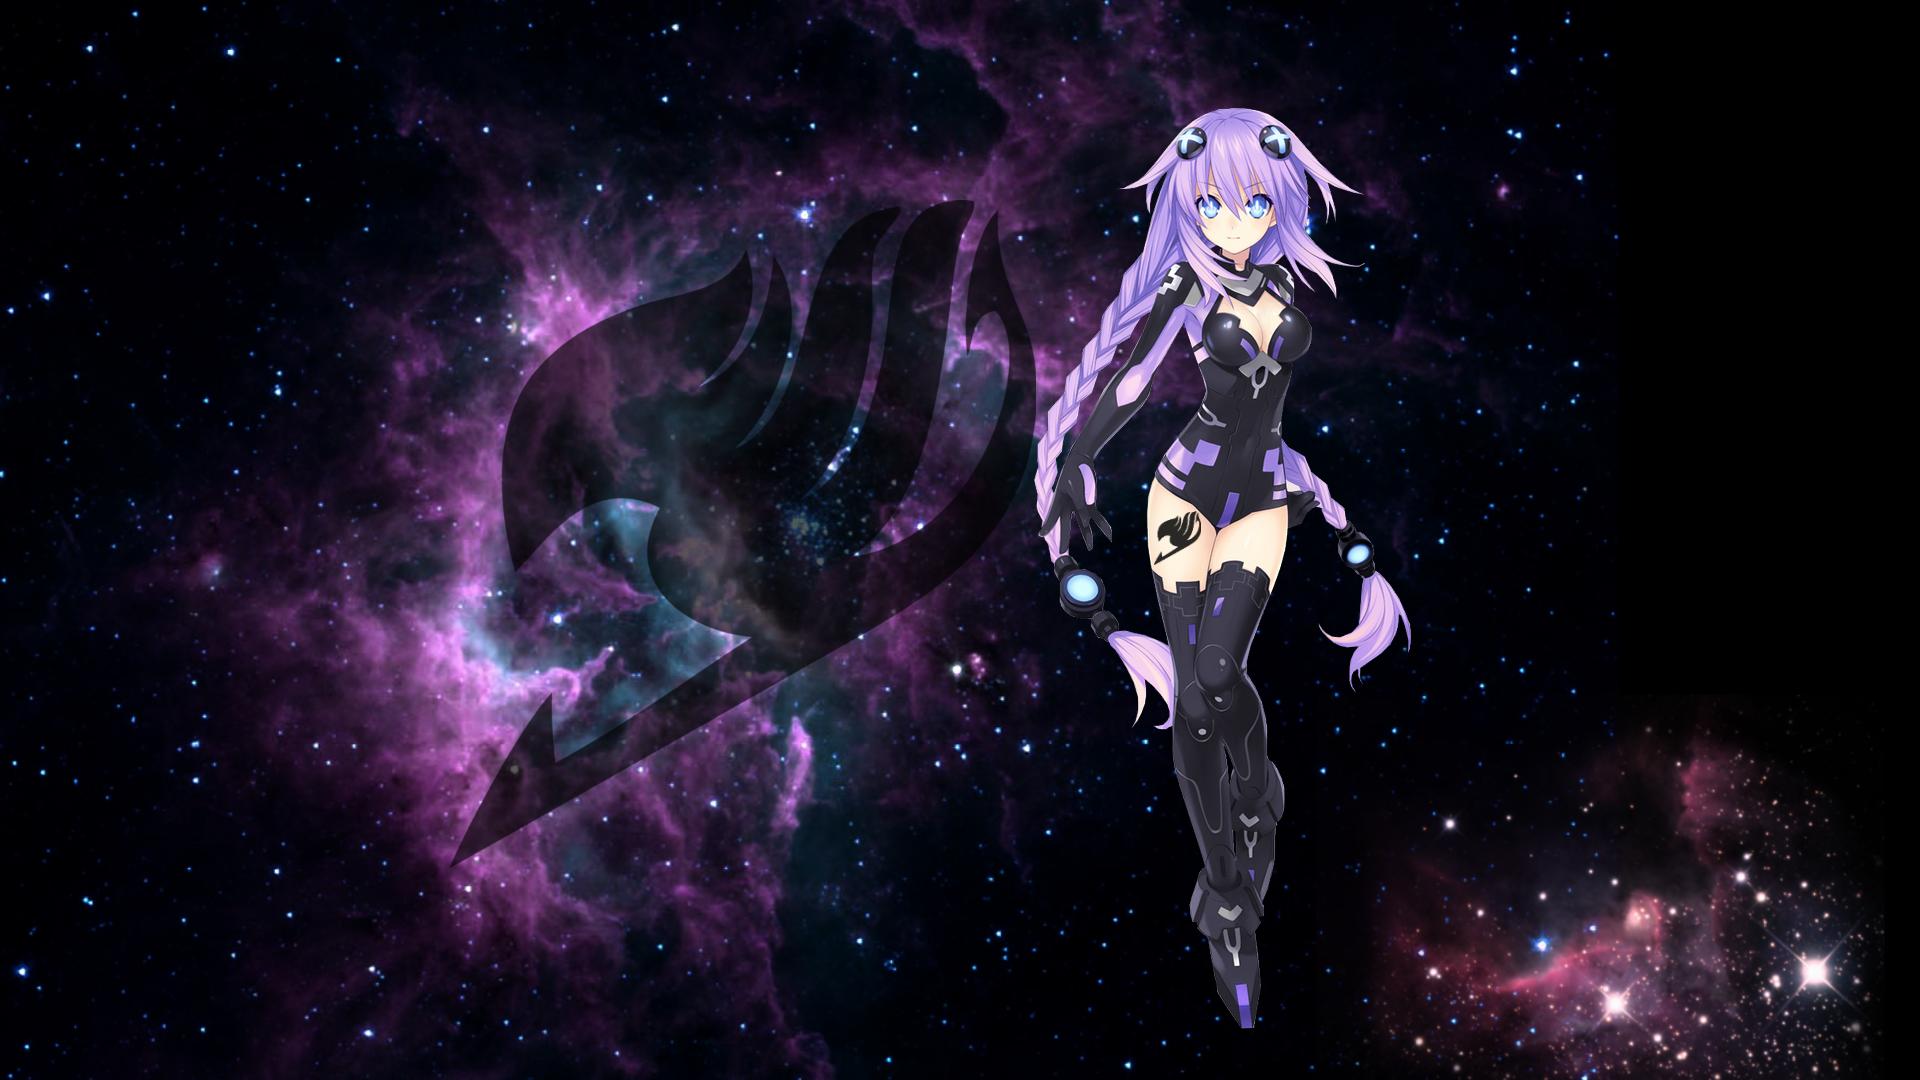 Download high res purple anime desktop background HD wallpaper 1920x1080